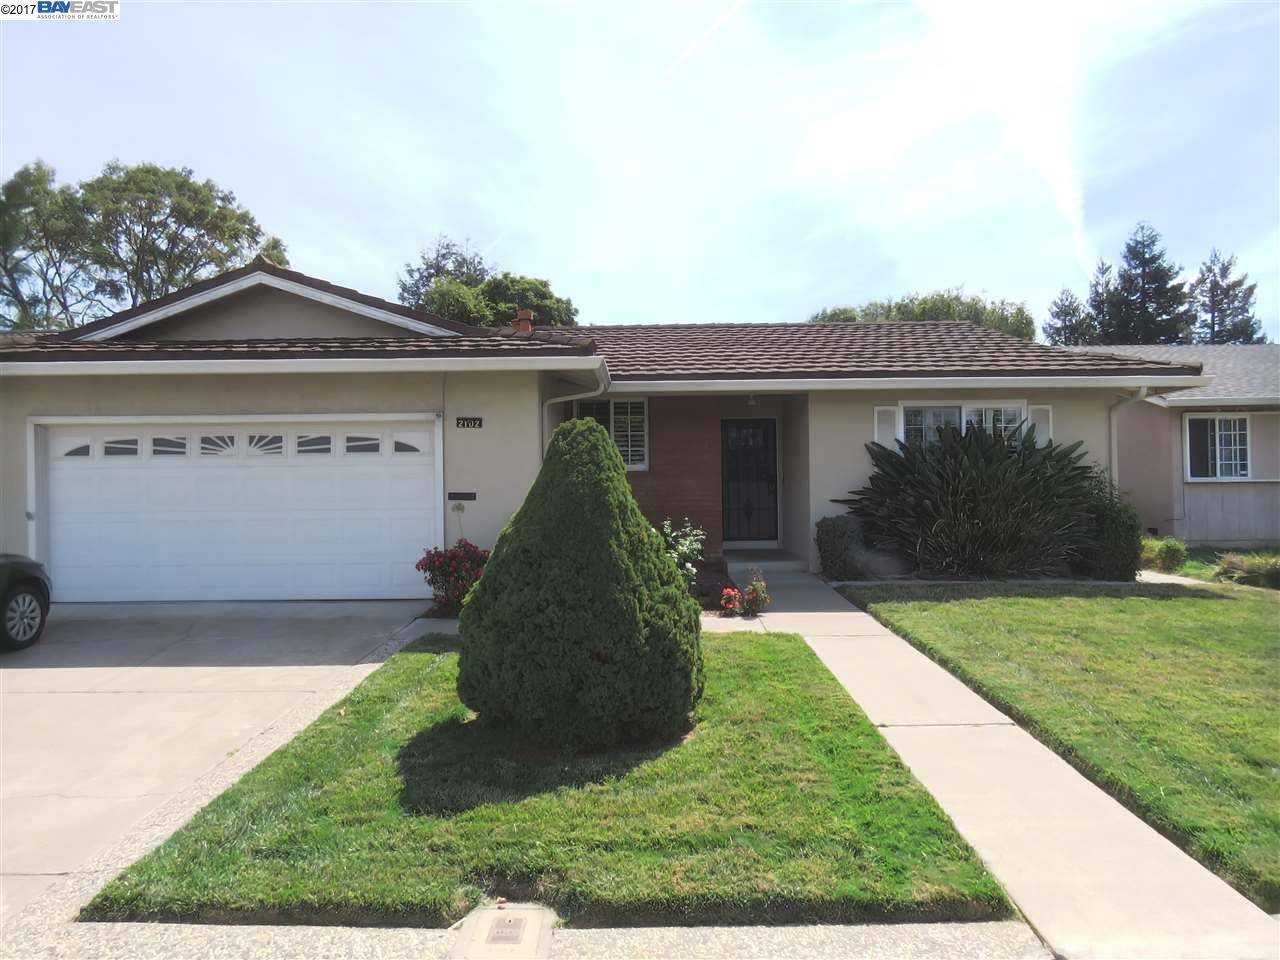 واحد منزل الأسرة للـ Rent في 2102 Farrol Avenue 2102 Farrol Avenue Union City, California 94587 United States